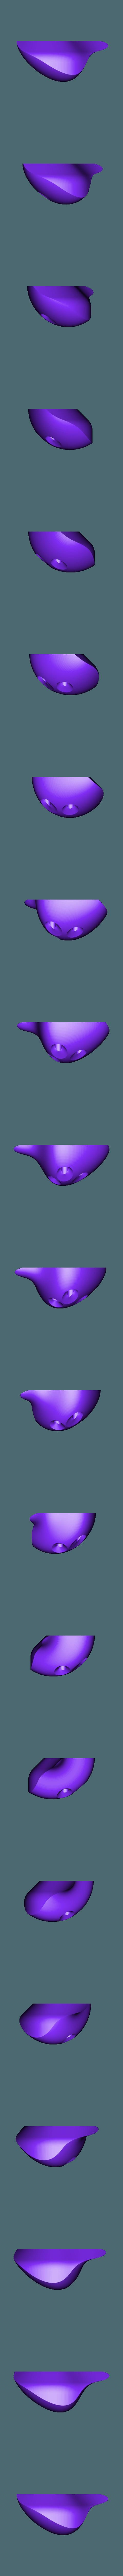 Pierre_1.stl Download free STL file Rock for Climbing Wall • 3D printing design, Zekazz